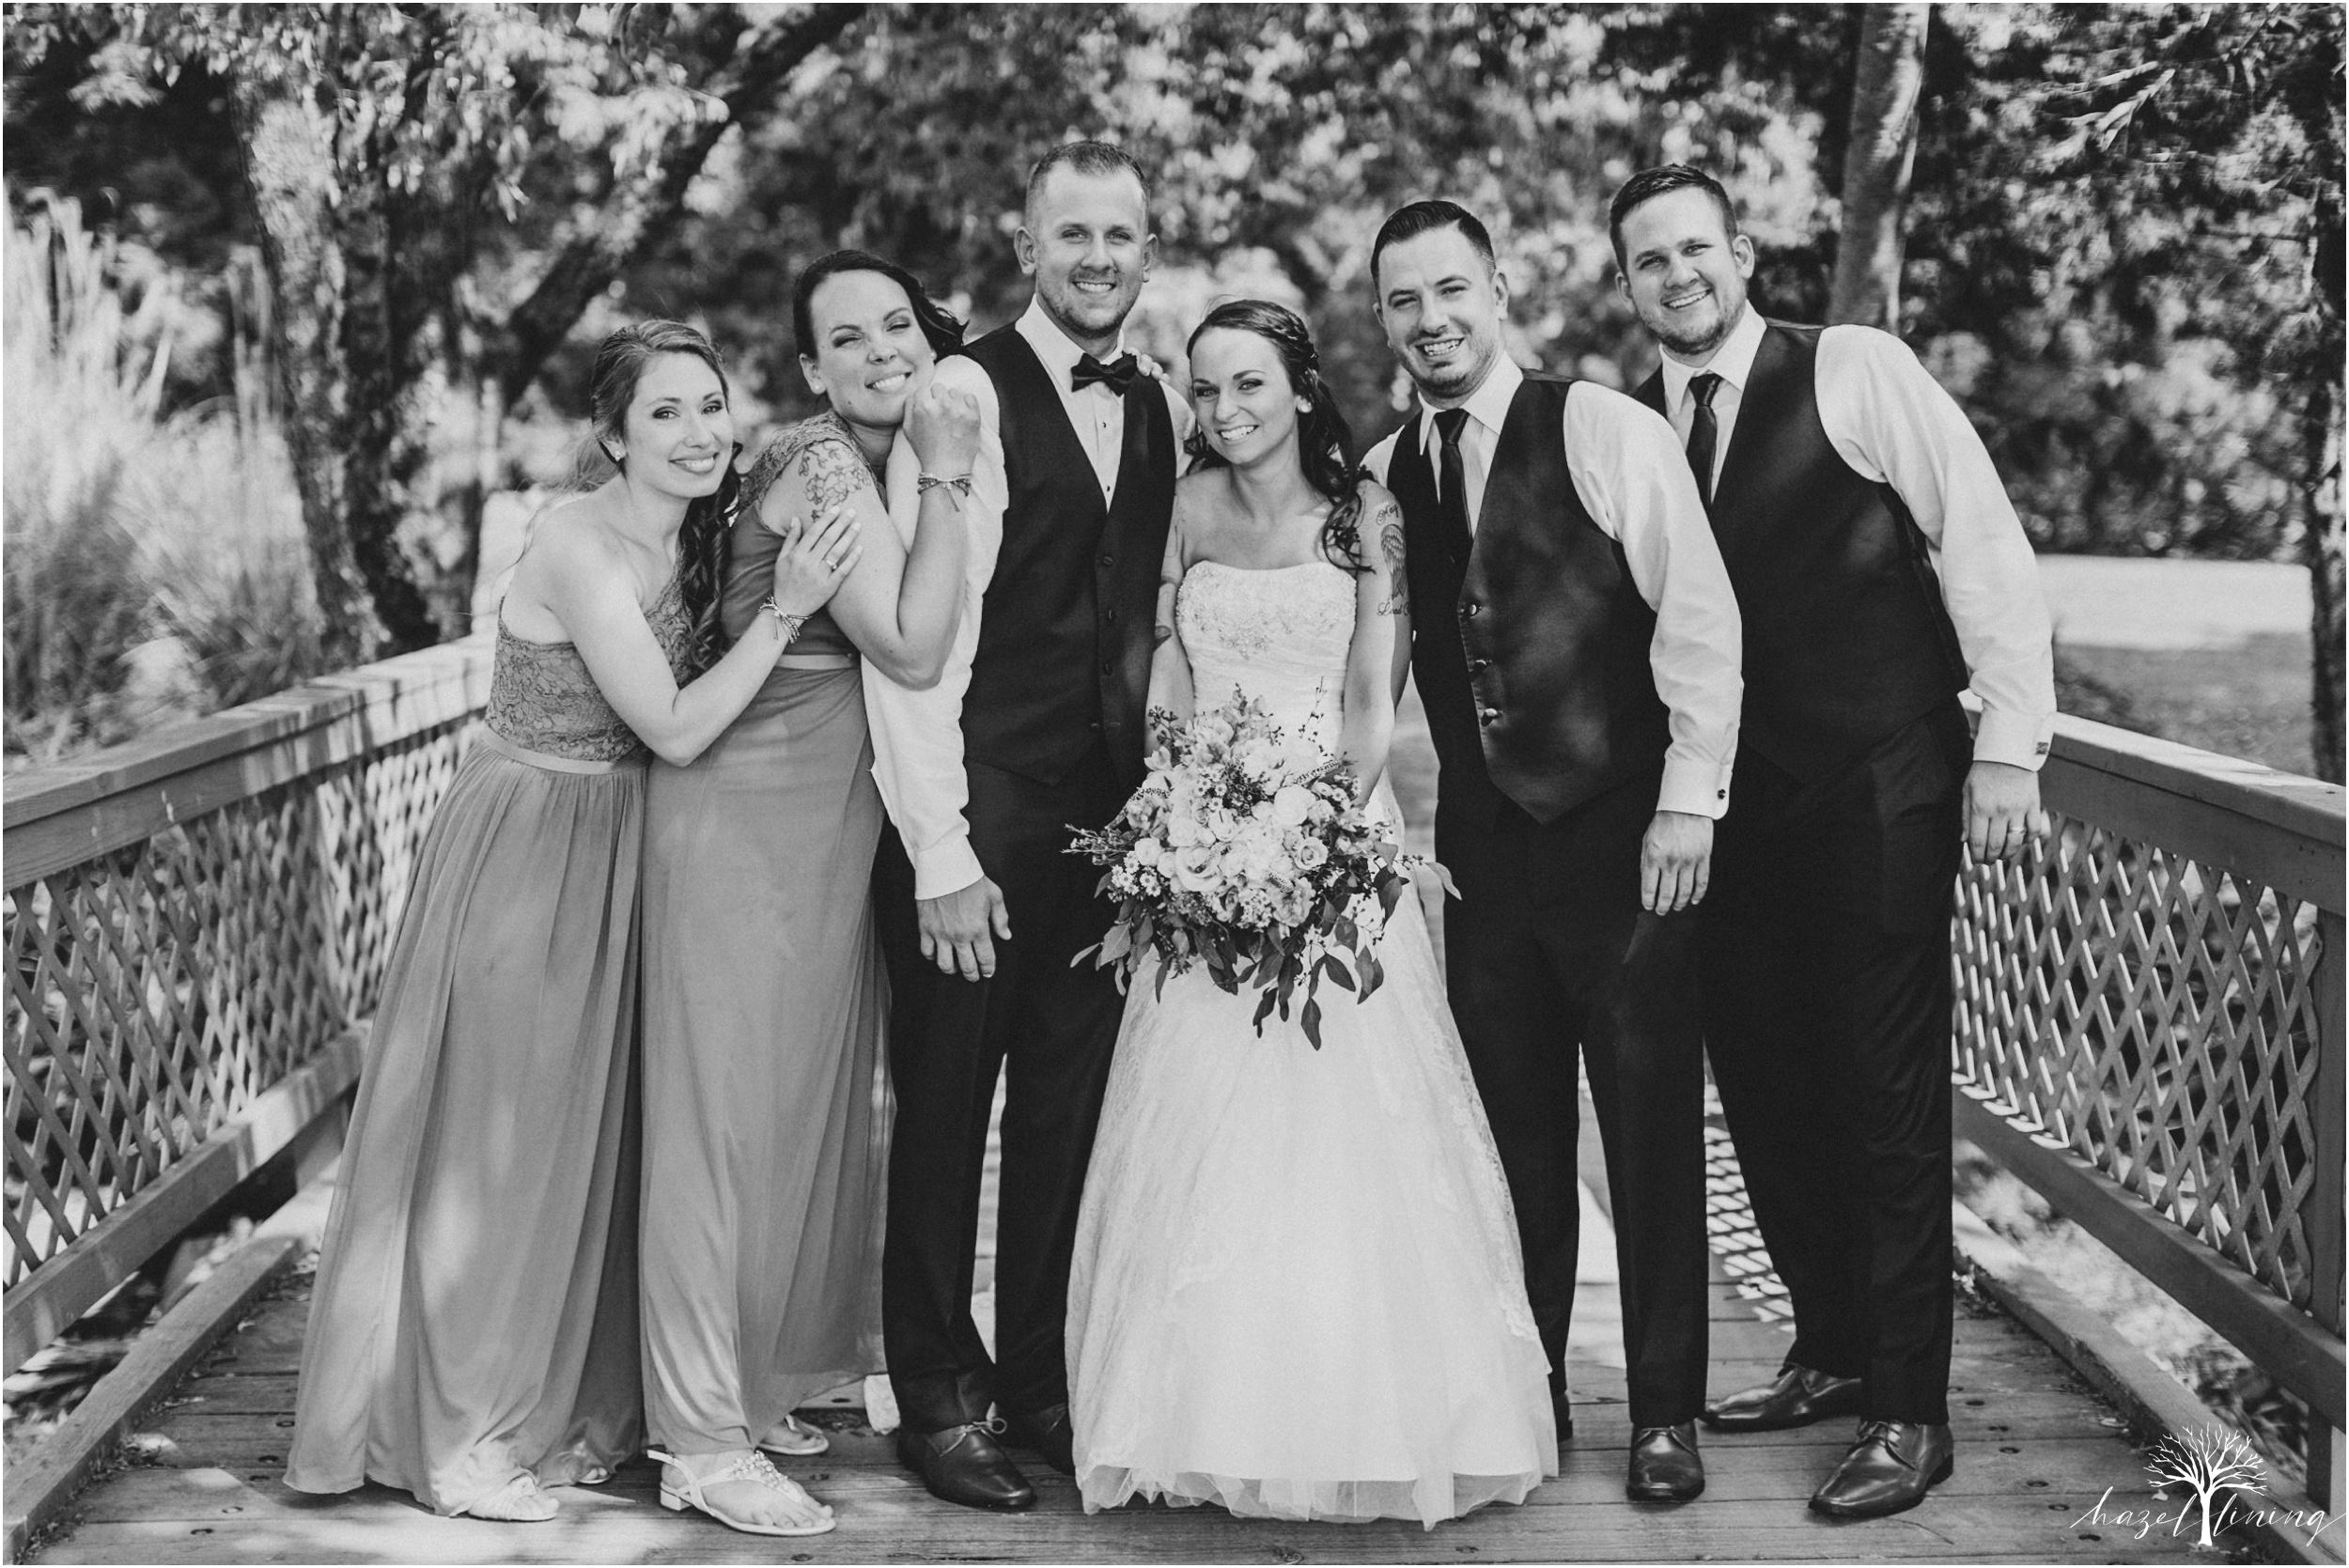 alyssa-james-stiteler-wedding-loft-and-sweet-water-cc-pennsburg-pennsylvania-hazel-lining-travel-wedding-elopement-photography_0074.jpg